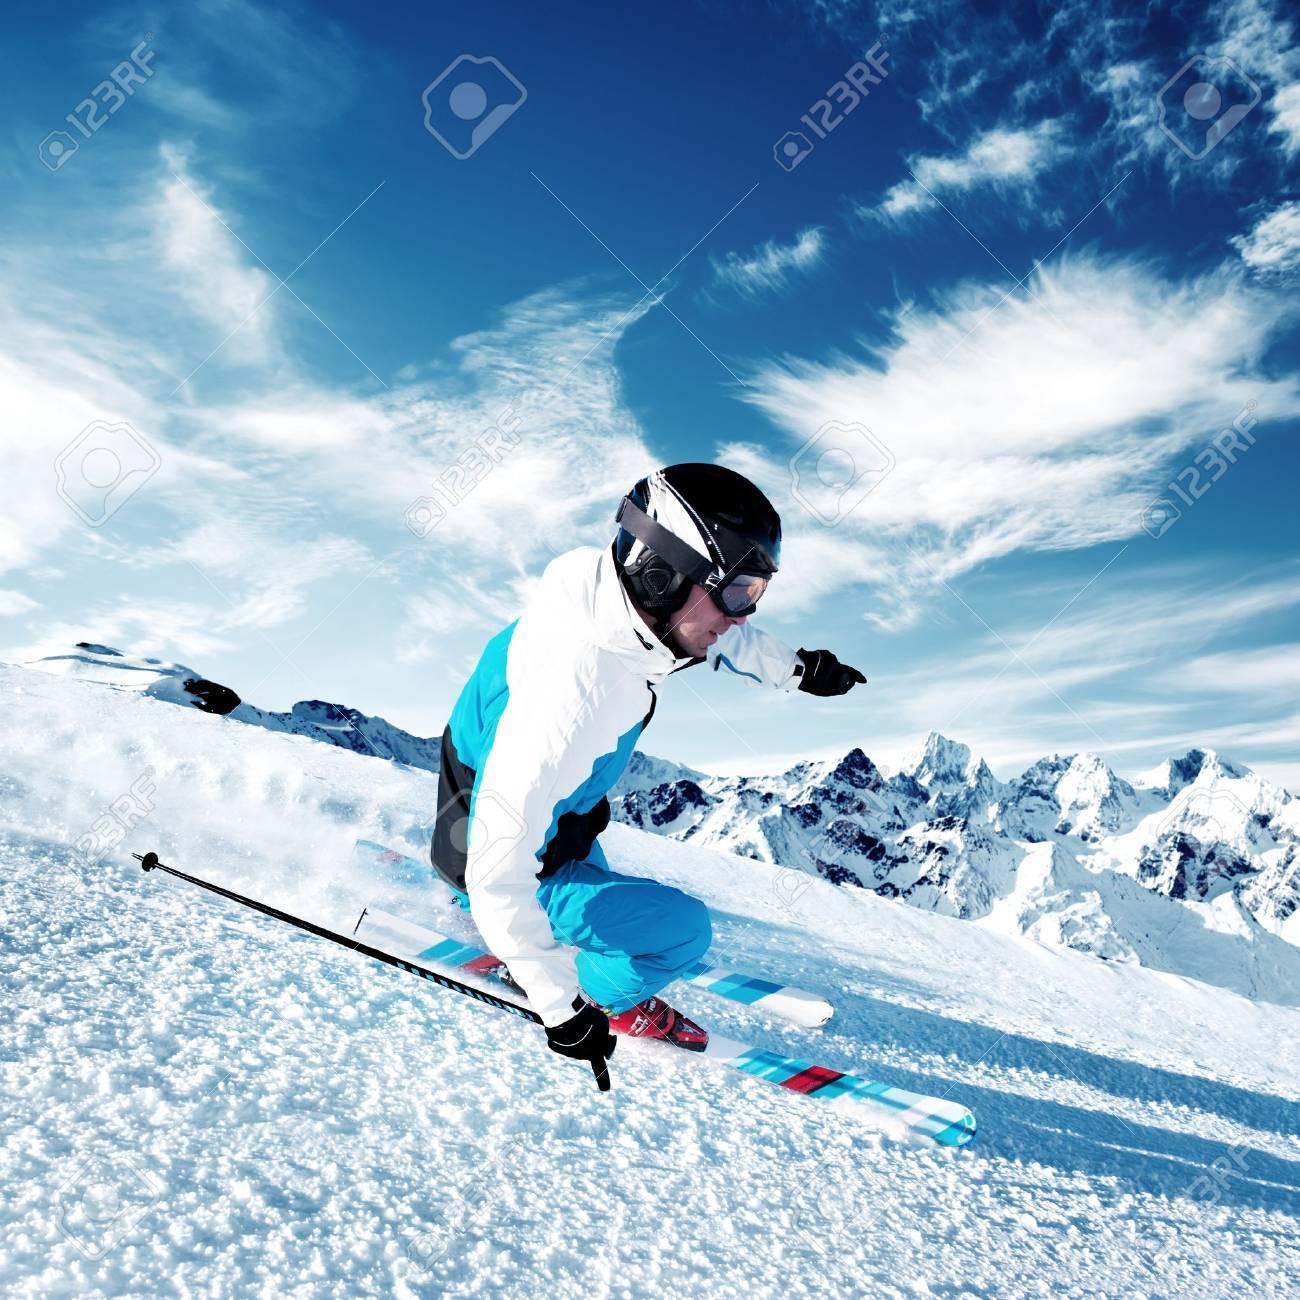 Skier in mountains, prepared piste - 17753054